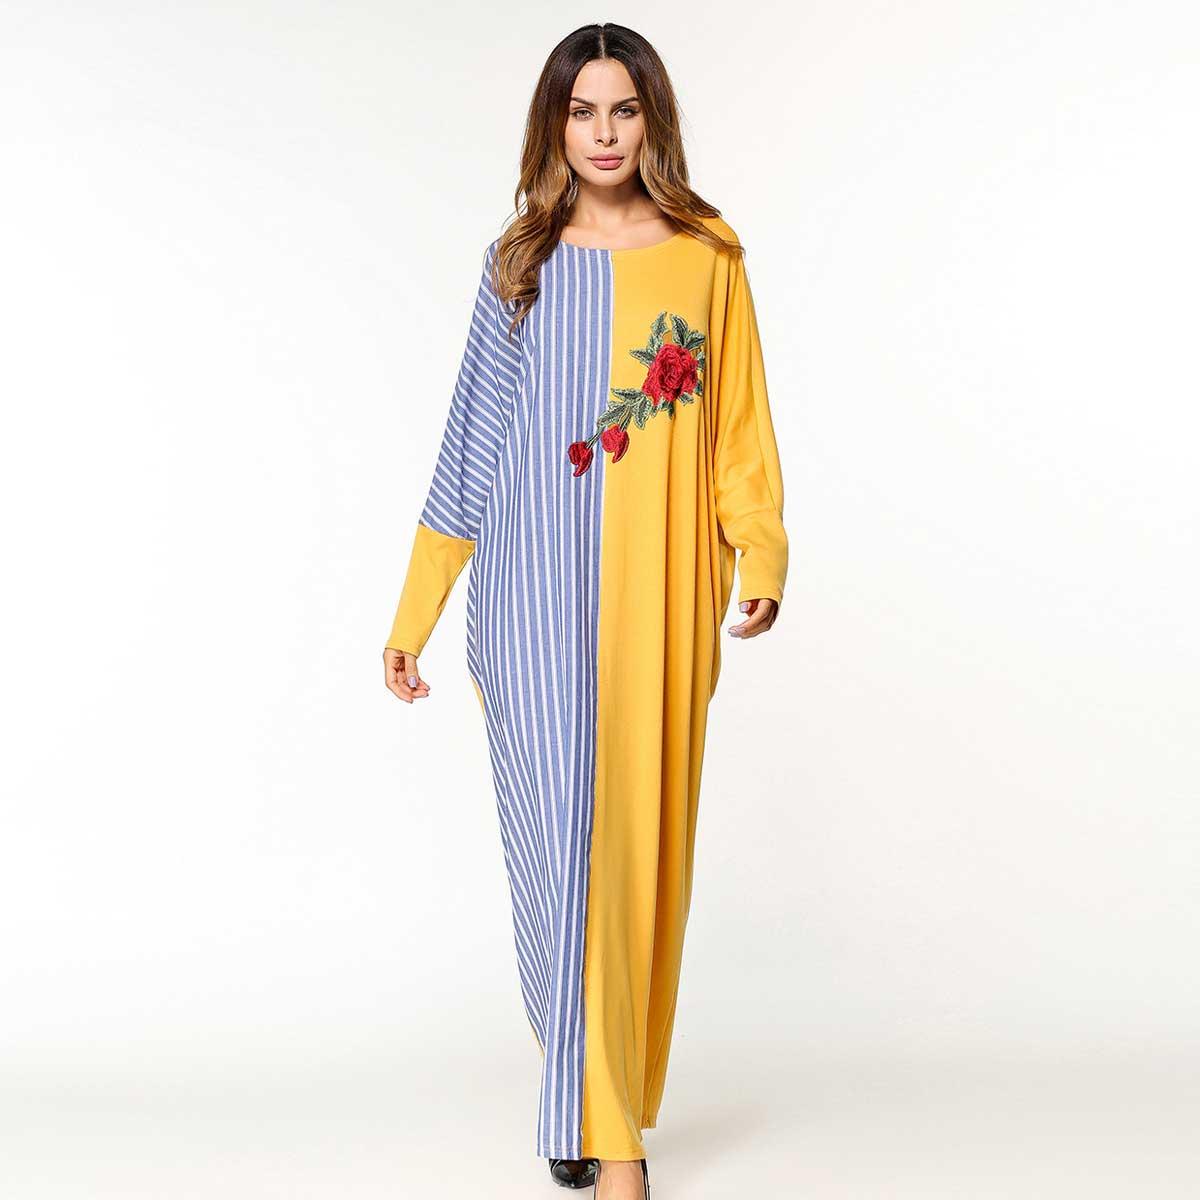 2019 Striped Floral Embroidery Patchwork Muslim Abaya Long Sleeve Women Dress  Dubai Islamic Arab Moroccan Kaftan Robe VKDR1468 44c8a950ad16